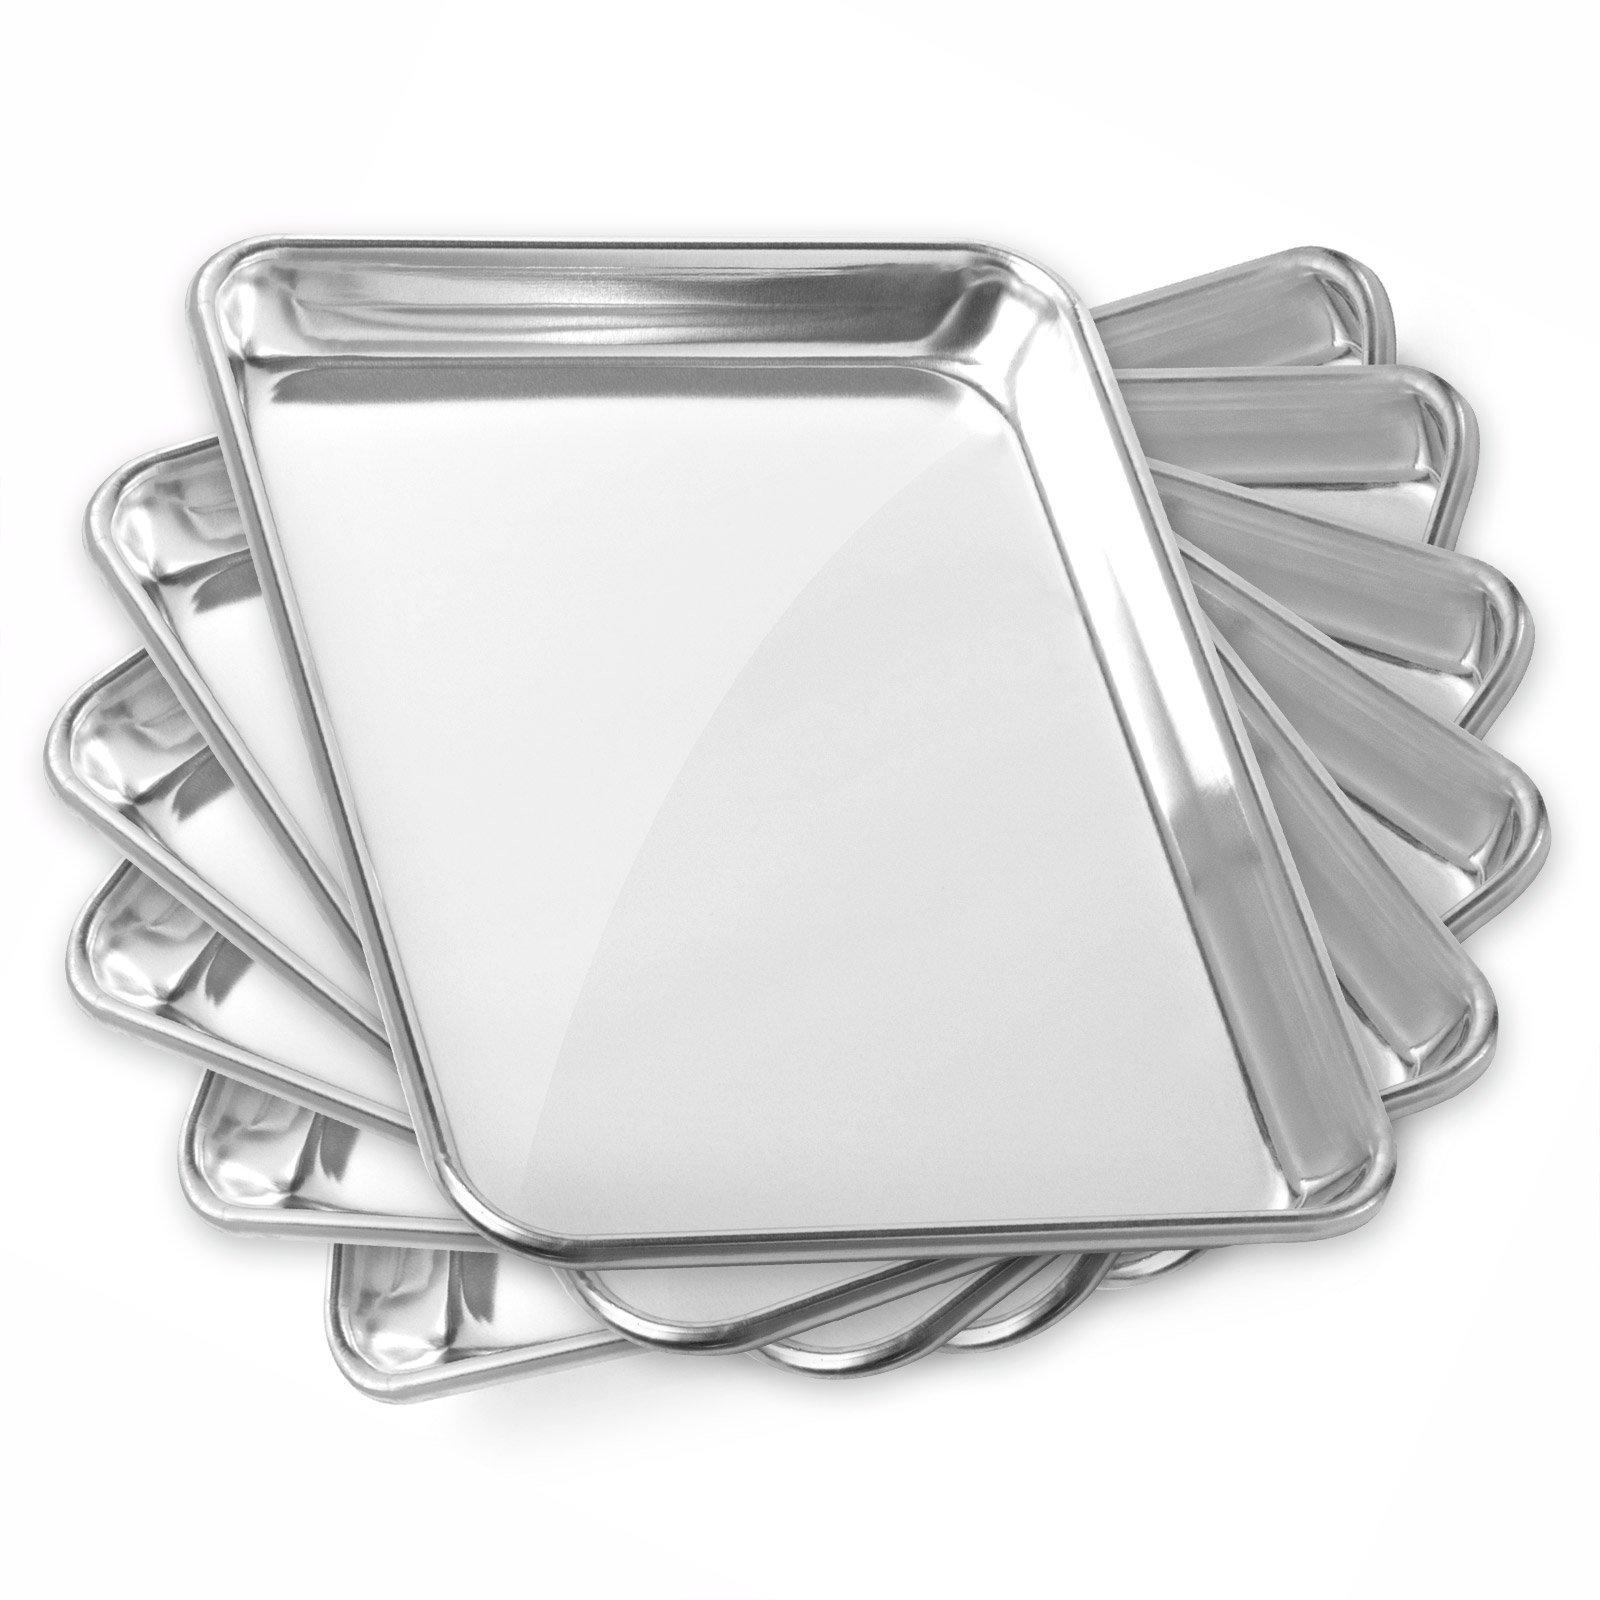 Gridmann 9 X 13 Commercial Grade Aluminium Cookie Sheet Baking Tray Jelly Rol.. 10